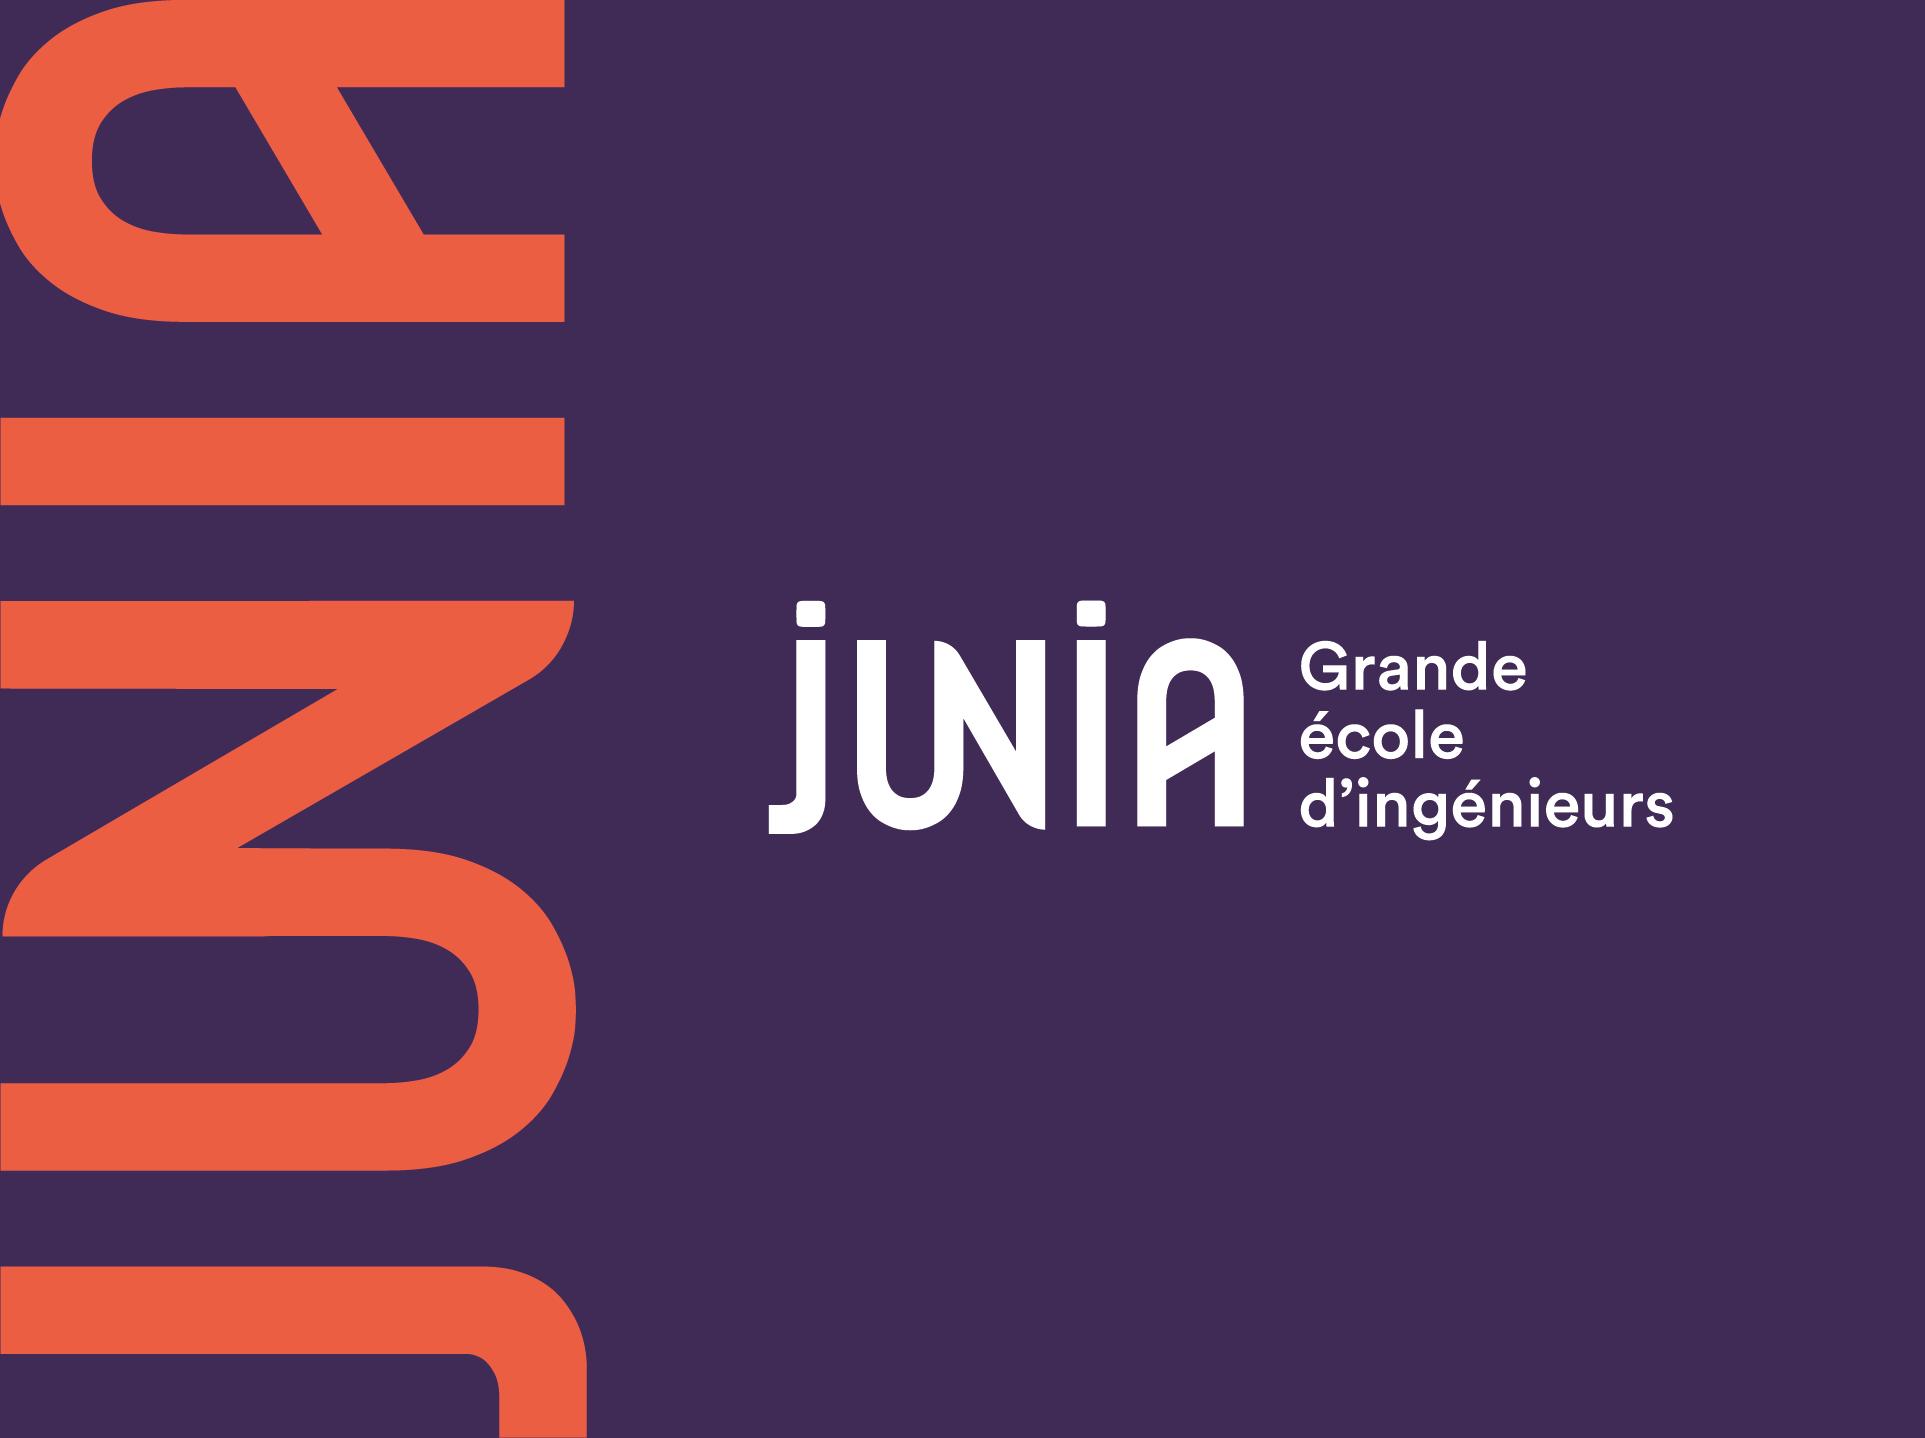 JUNIA Ecole d'Ingénieurs